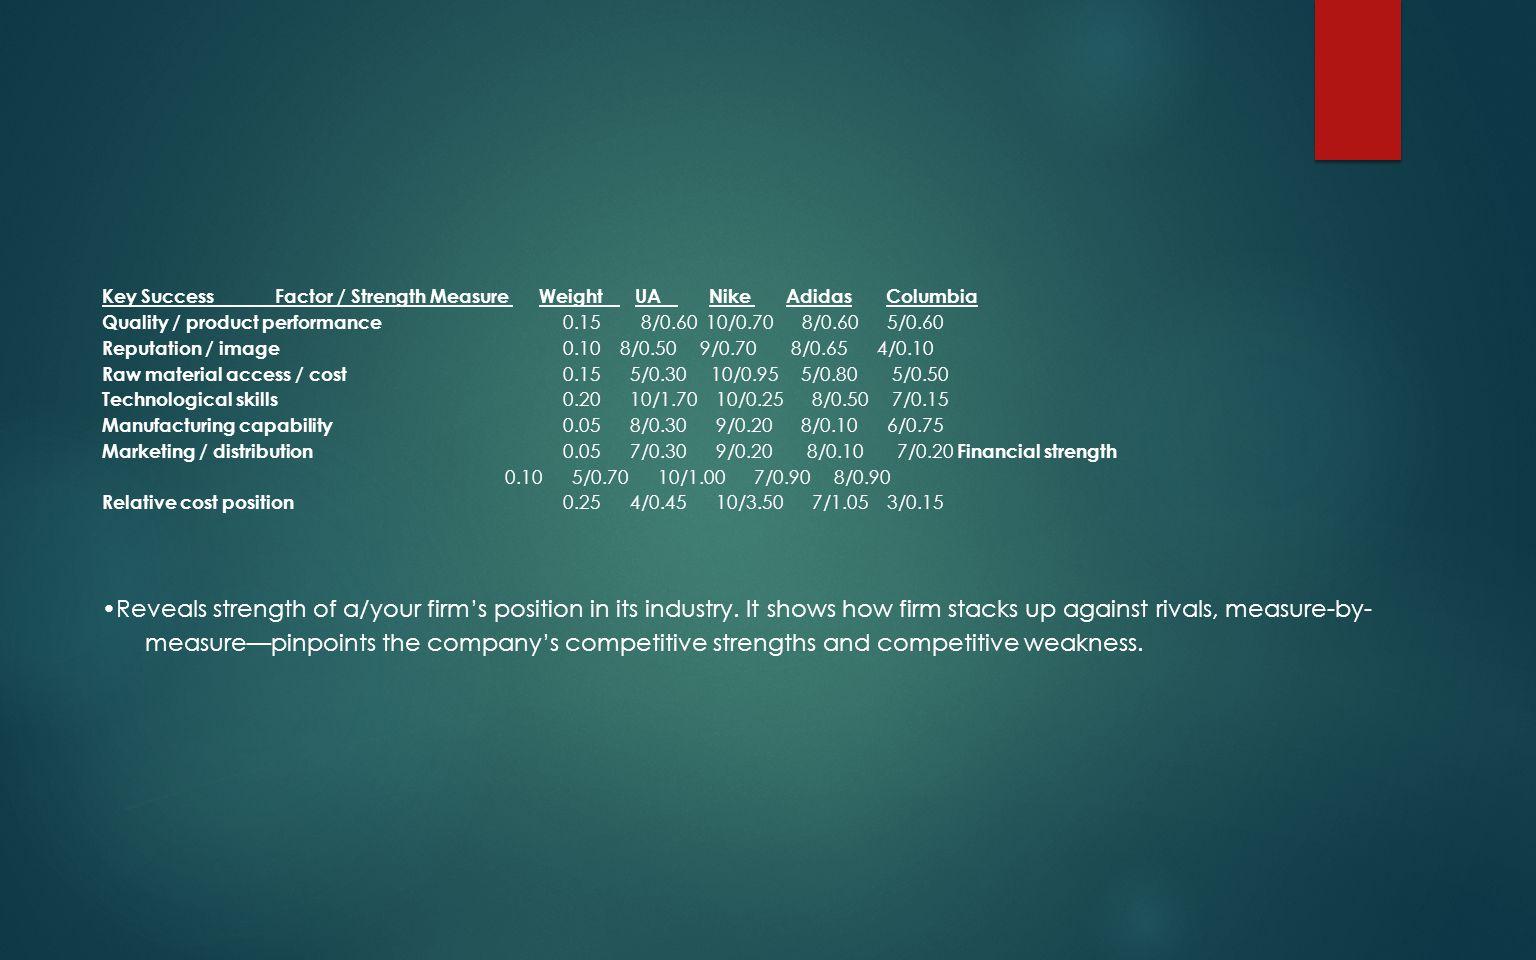 Key Success Factor / Strength Measure Weight UA Nike Adidas Columbia Quality / product performance 0.15 8/0.60 10/0.70 8/0.60 5/0.60 Reputation / imag